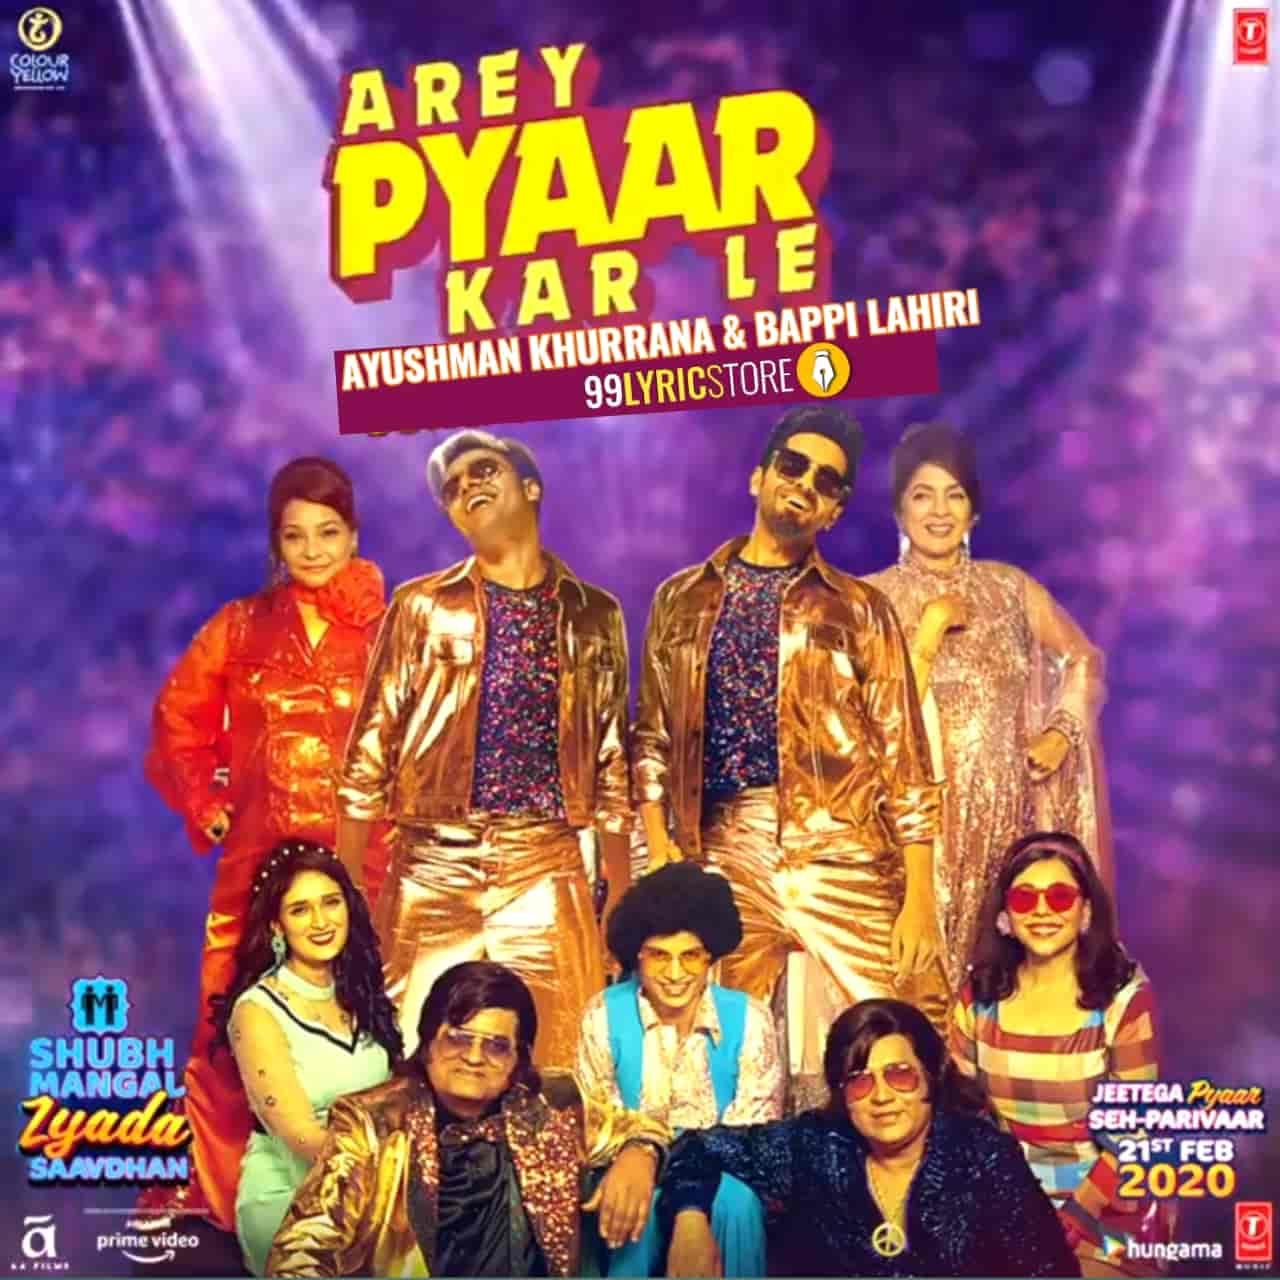 Arey pyaar karle Song Image Ayushman khurrana and Bappi Lahiri by Sung.